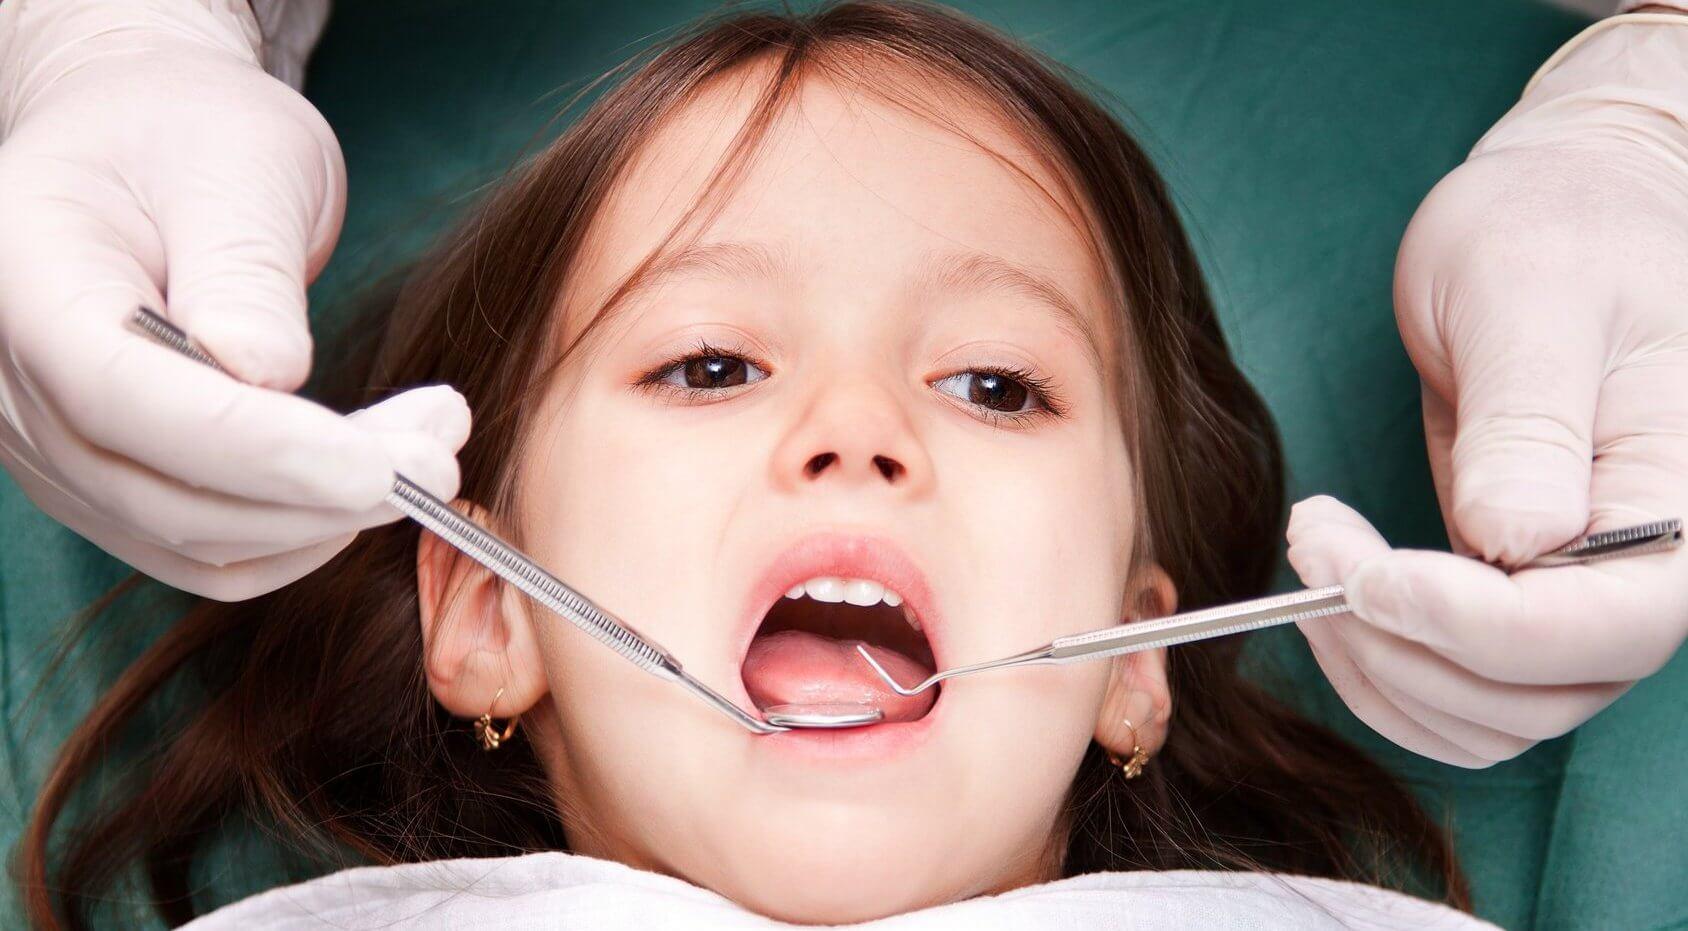 серебрение молочного зуба у ребенка